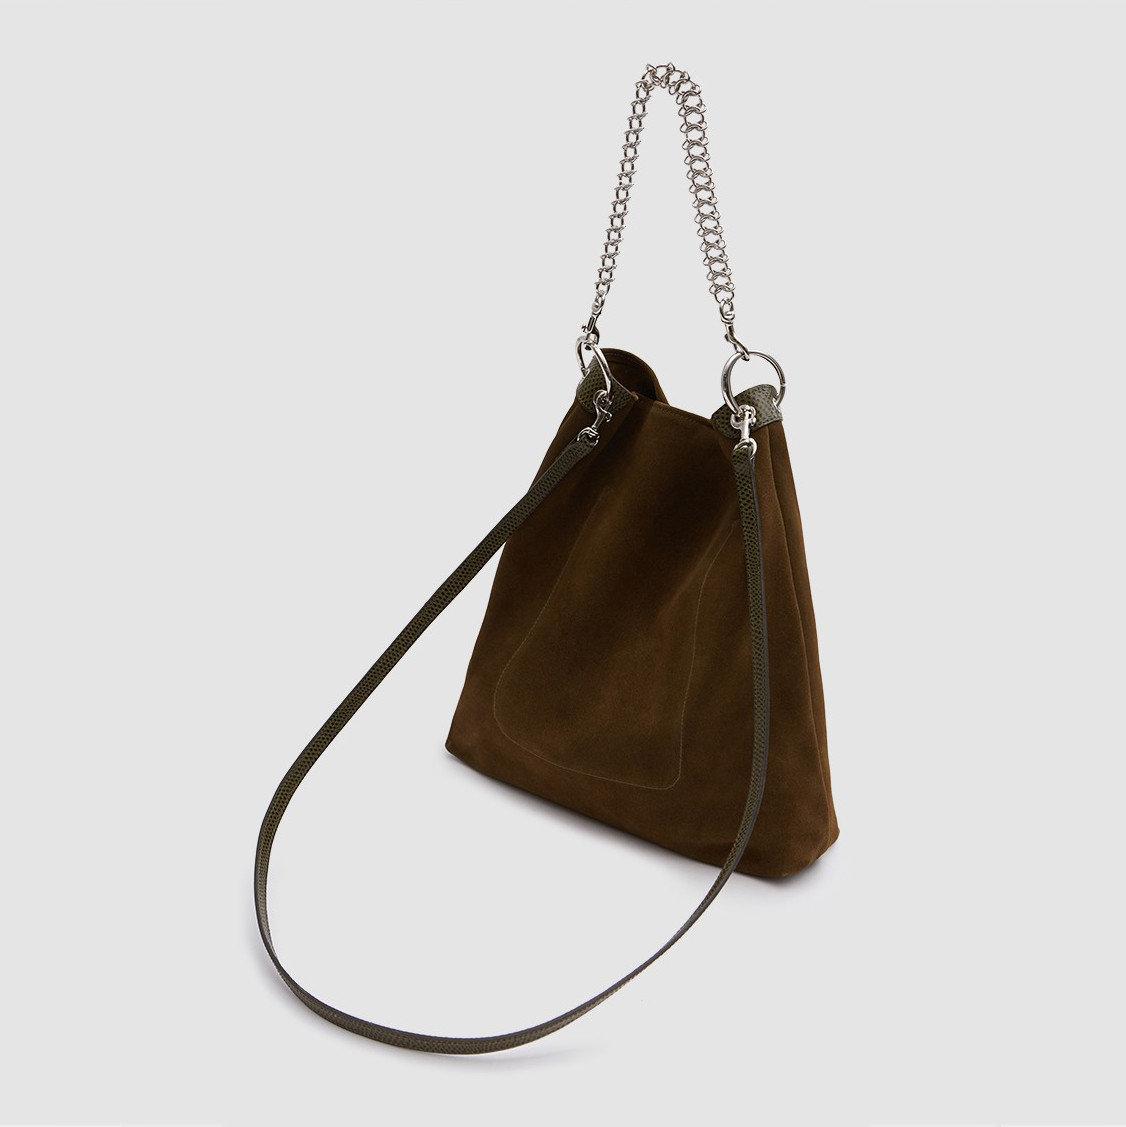 Trip Ideas bag shoulder bag handbag brown leather product accessory product design scale brand beige locket